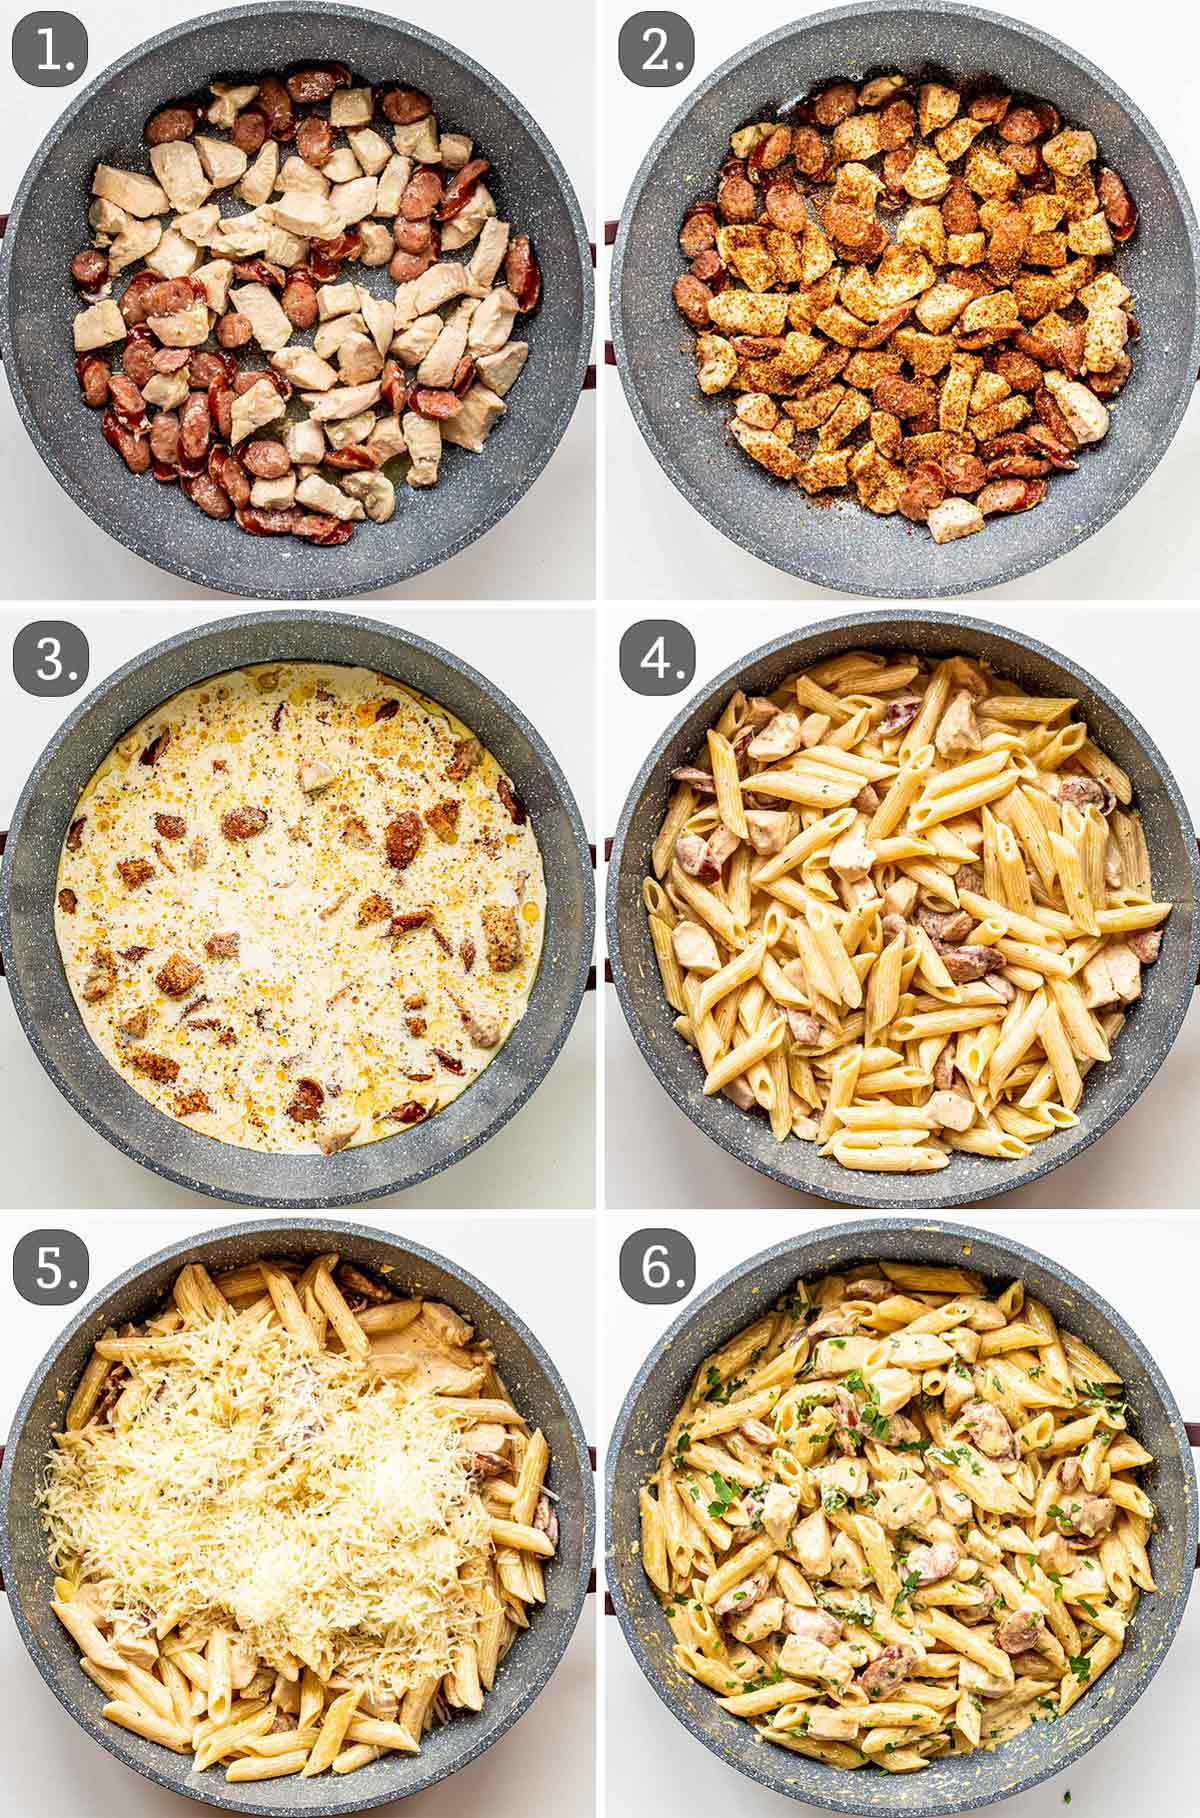 process shots showing how to make cajun chicken alfredo.